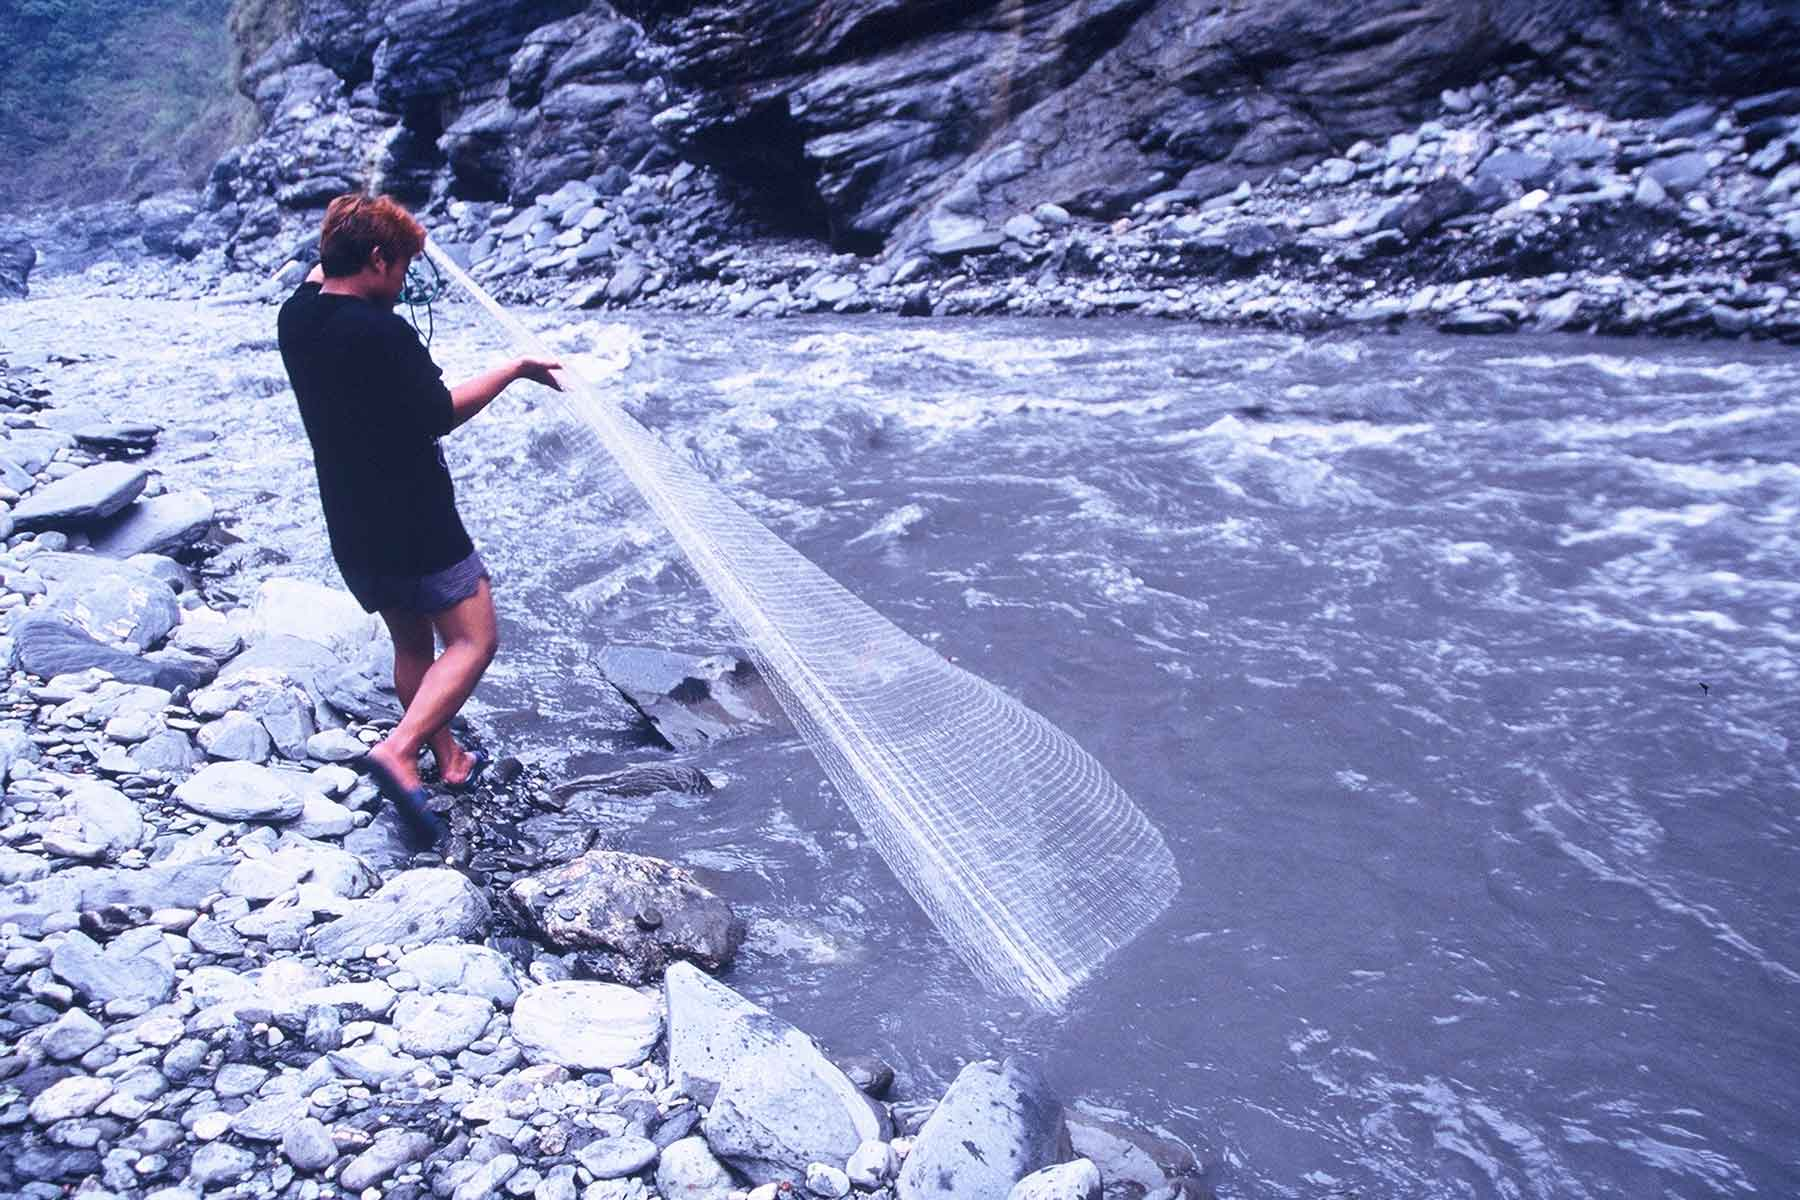 Bunun Fishing at 內本鹿 Laipunuk Photo Journal - Steven Andrew Martin - Taiwan Studies